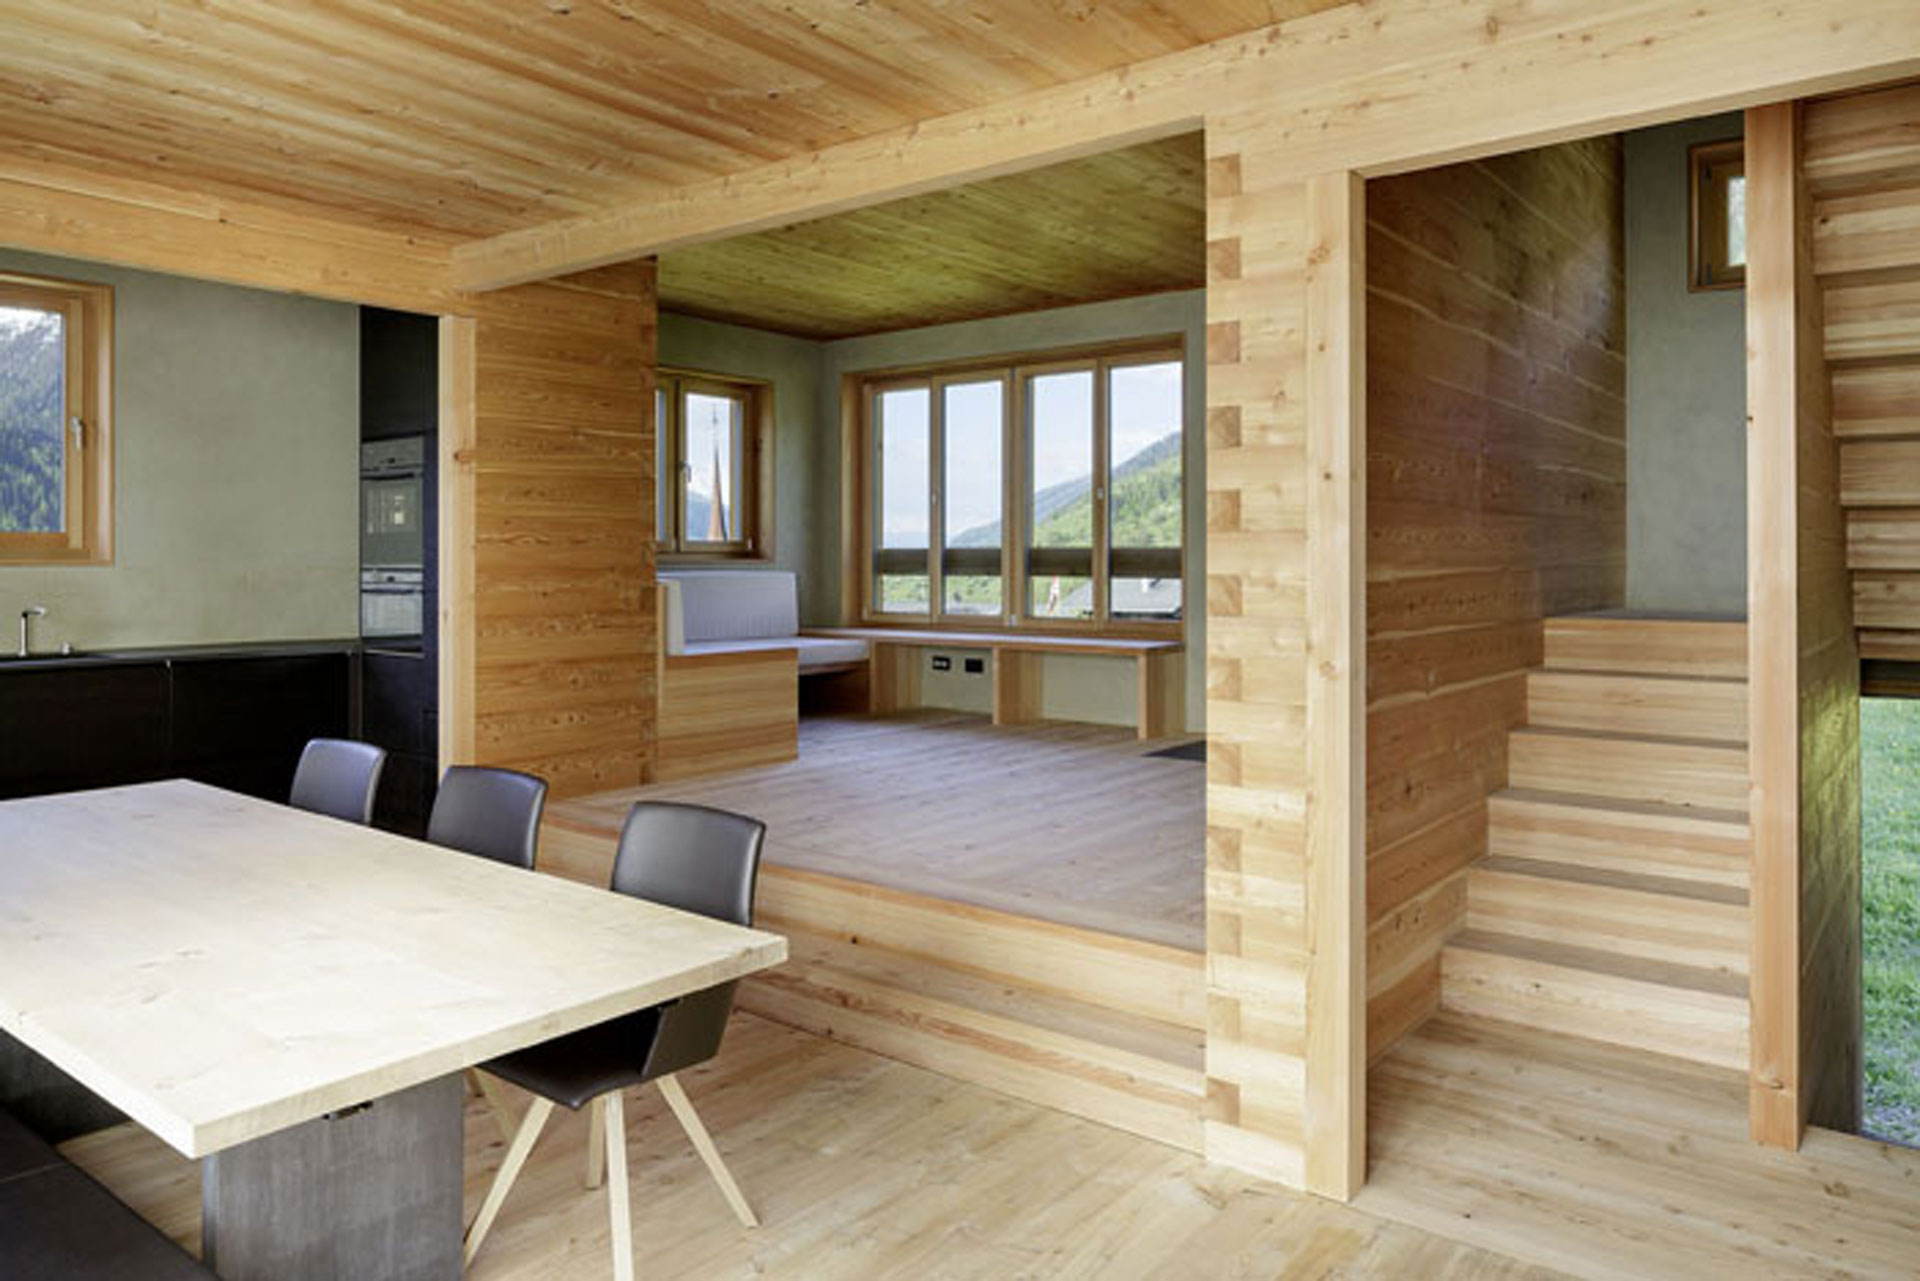 Holz100 Haus Innenraum